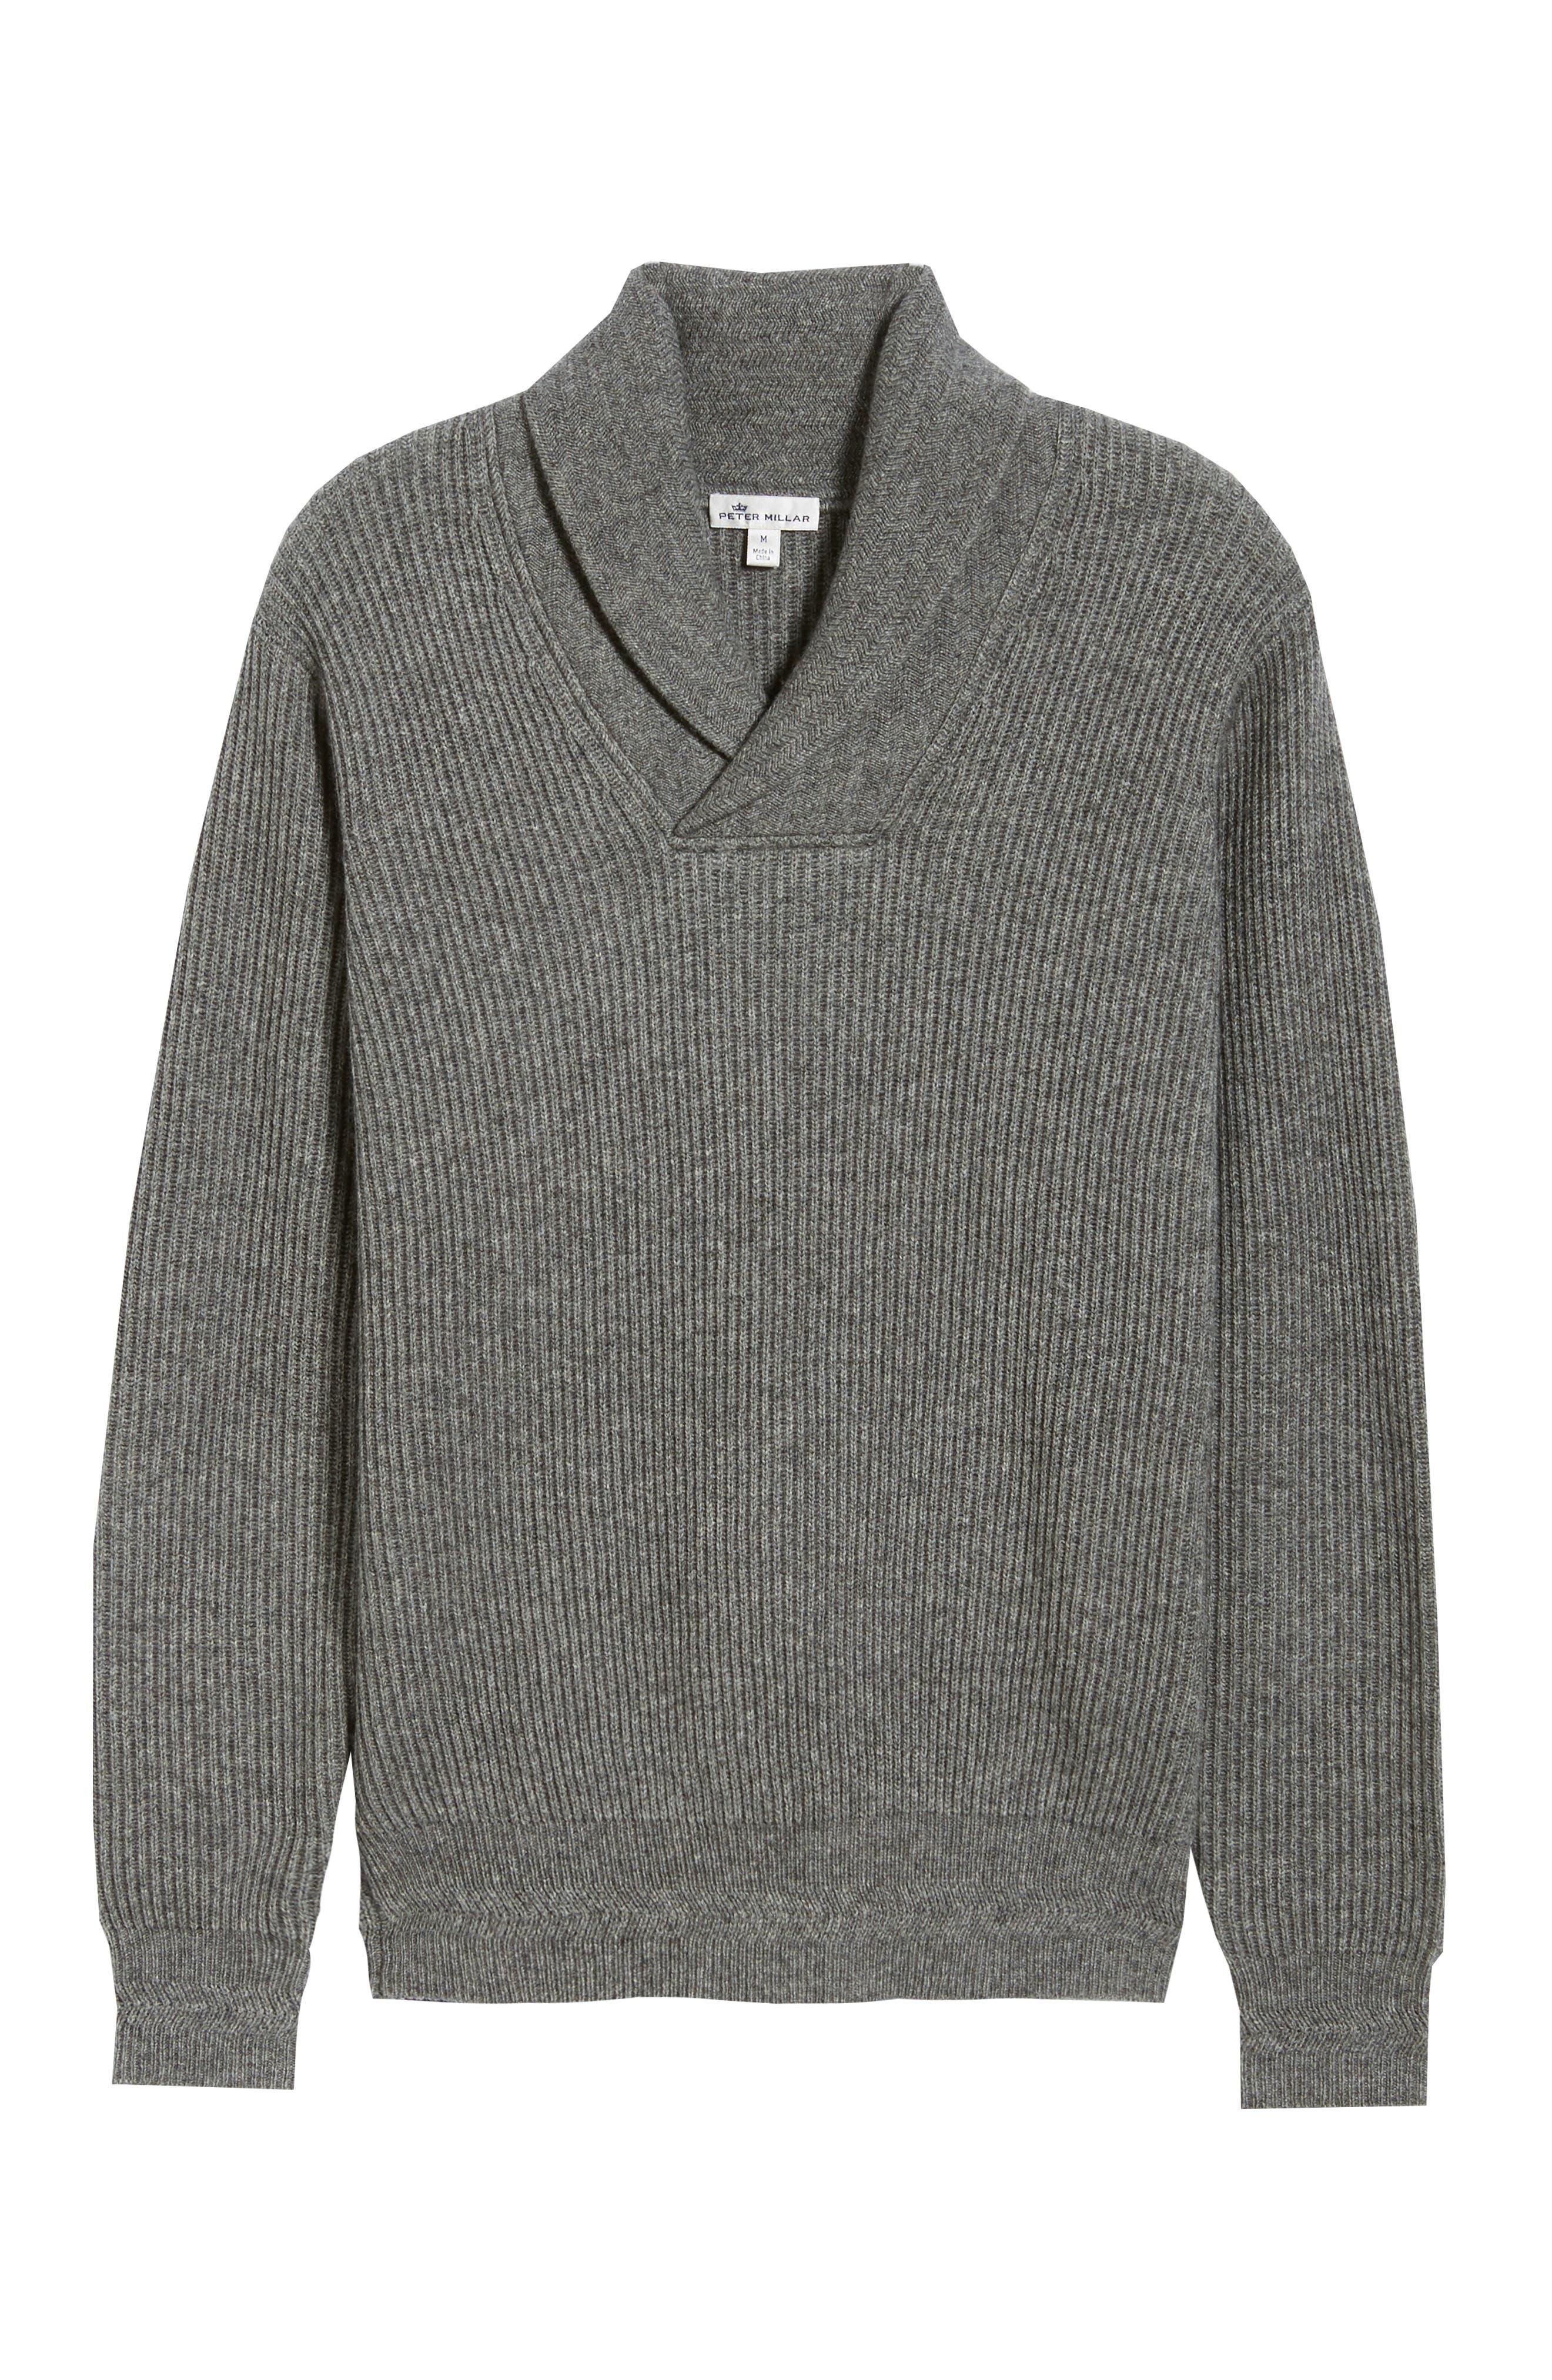 Mountainside Wool Blend Shawl Sweater,                             Alternate thumbnail 6, color,                             025